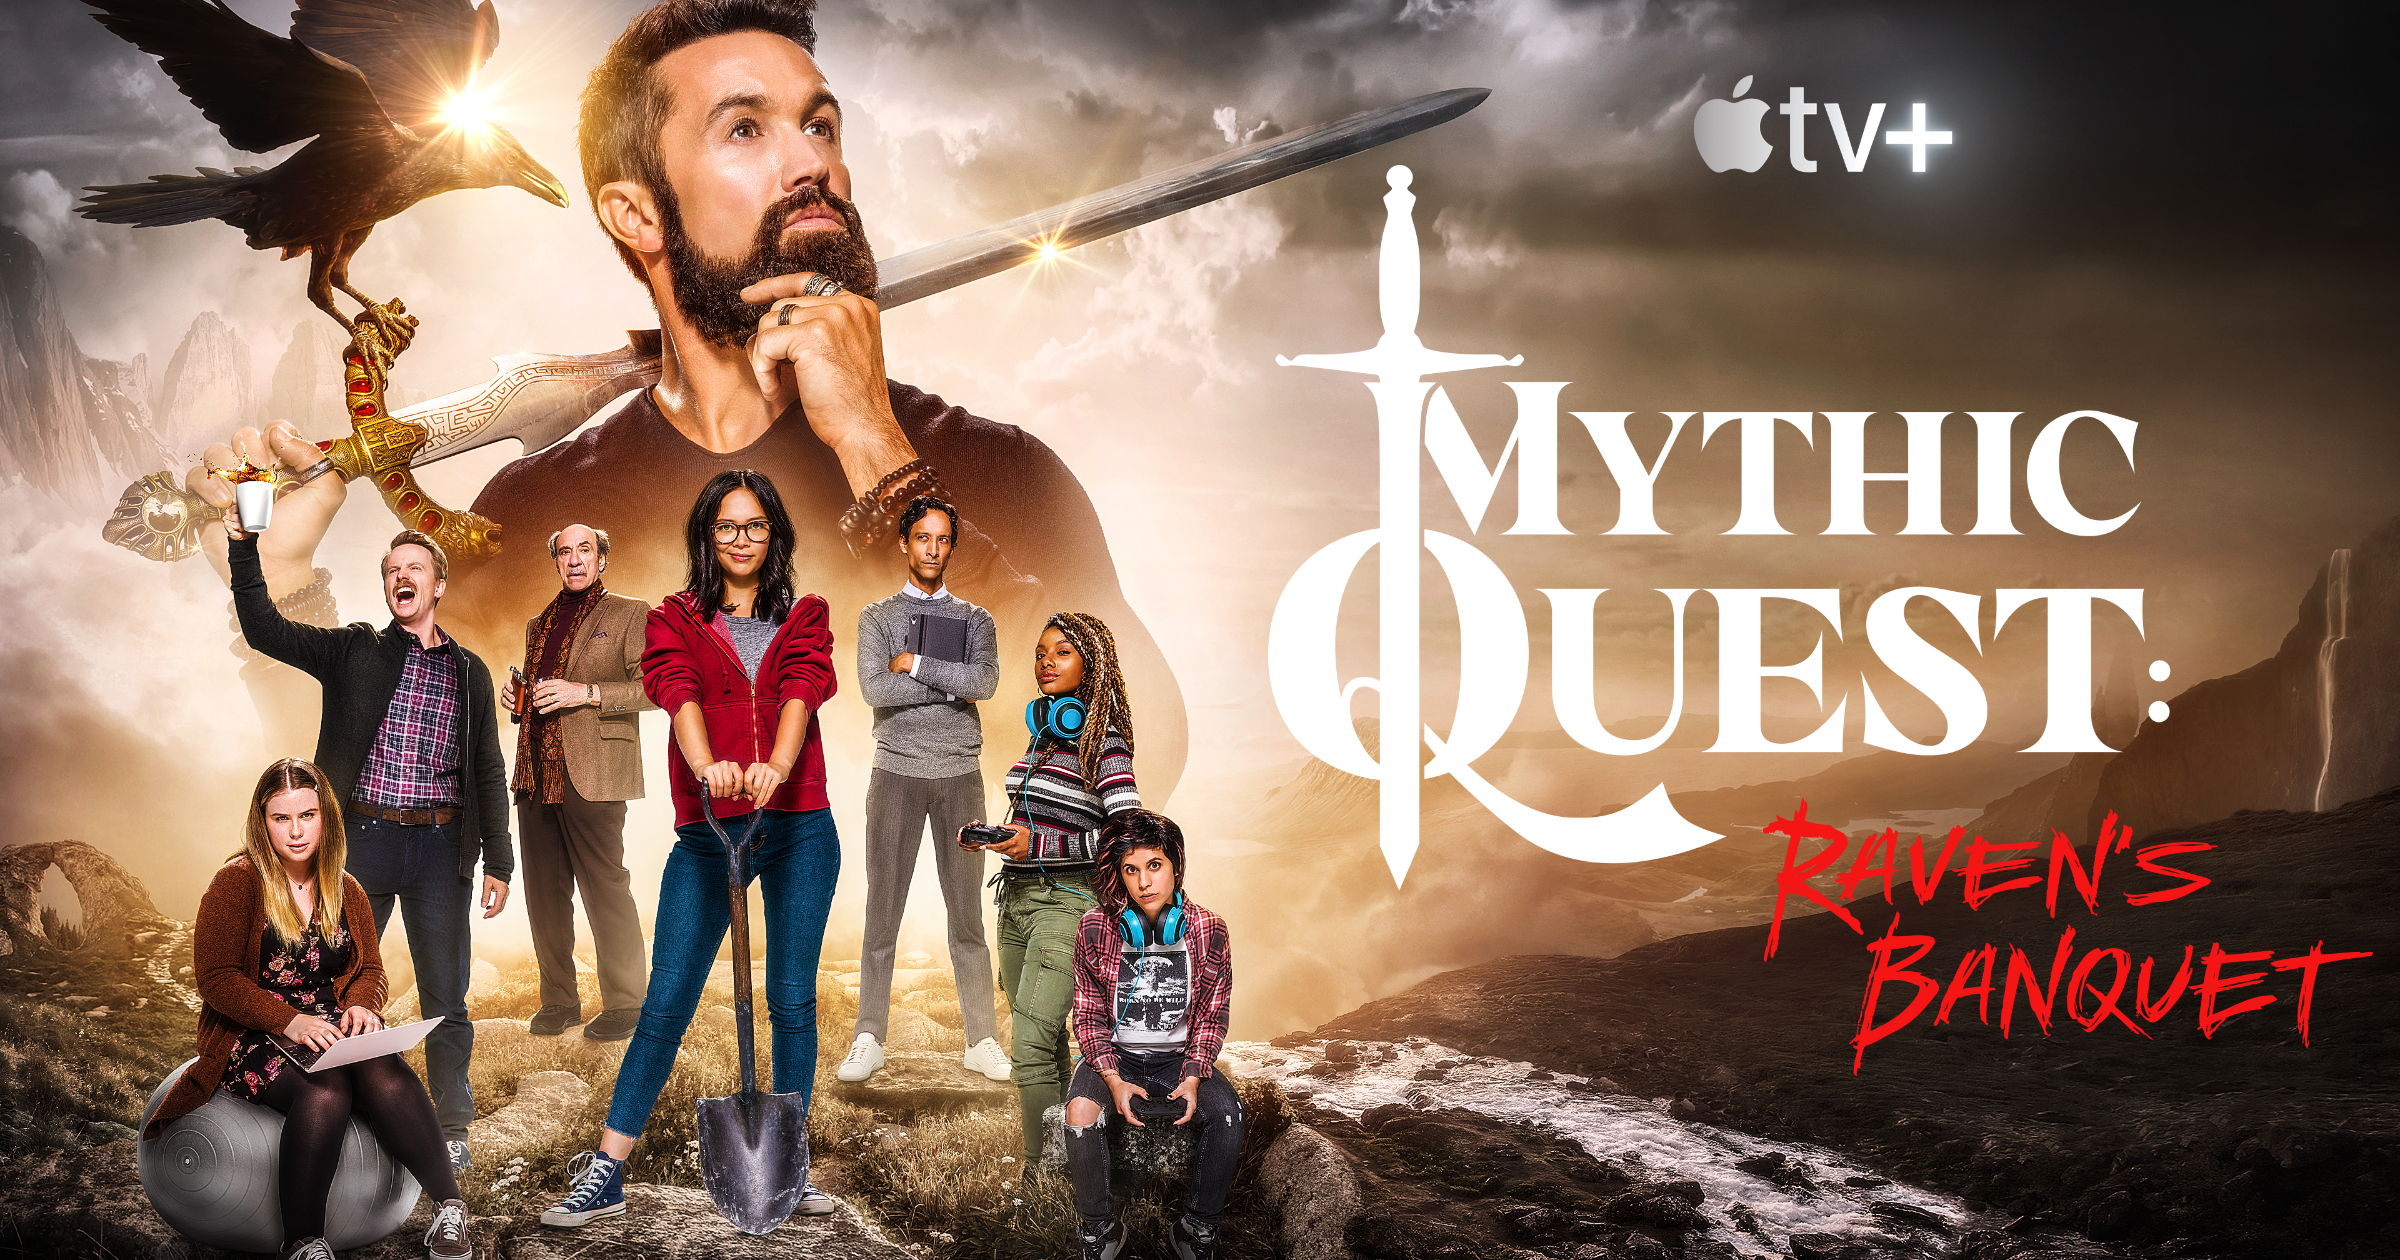 Mythic Quest Ravens Banquet on Apple TV+